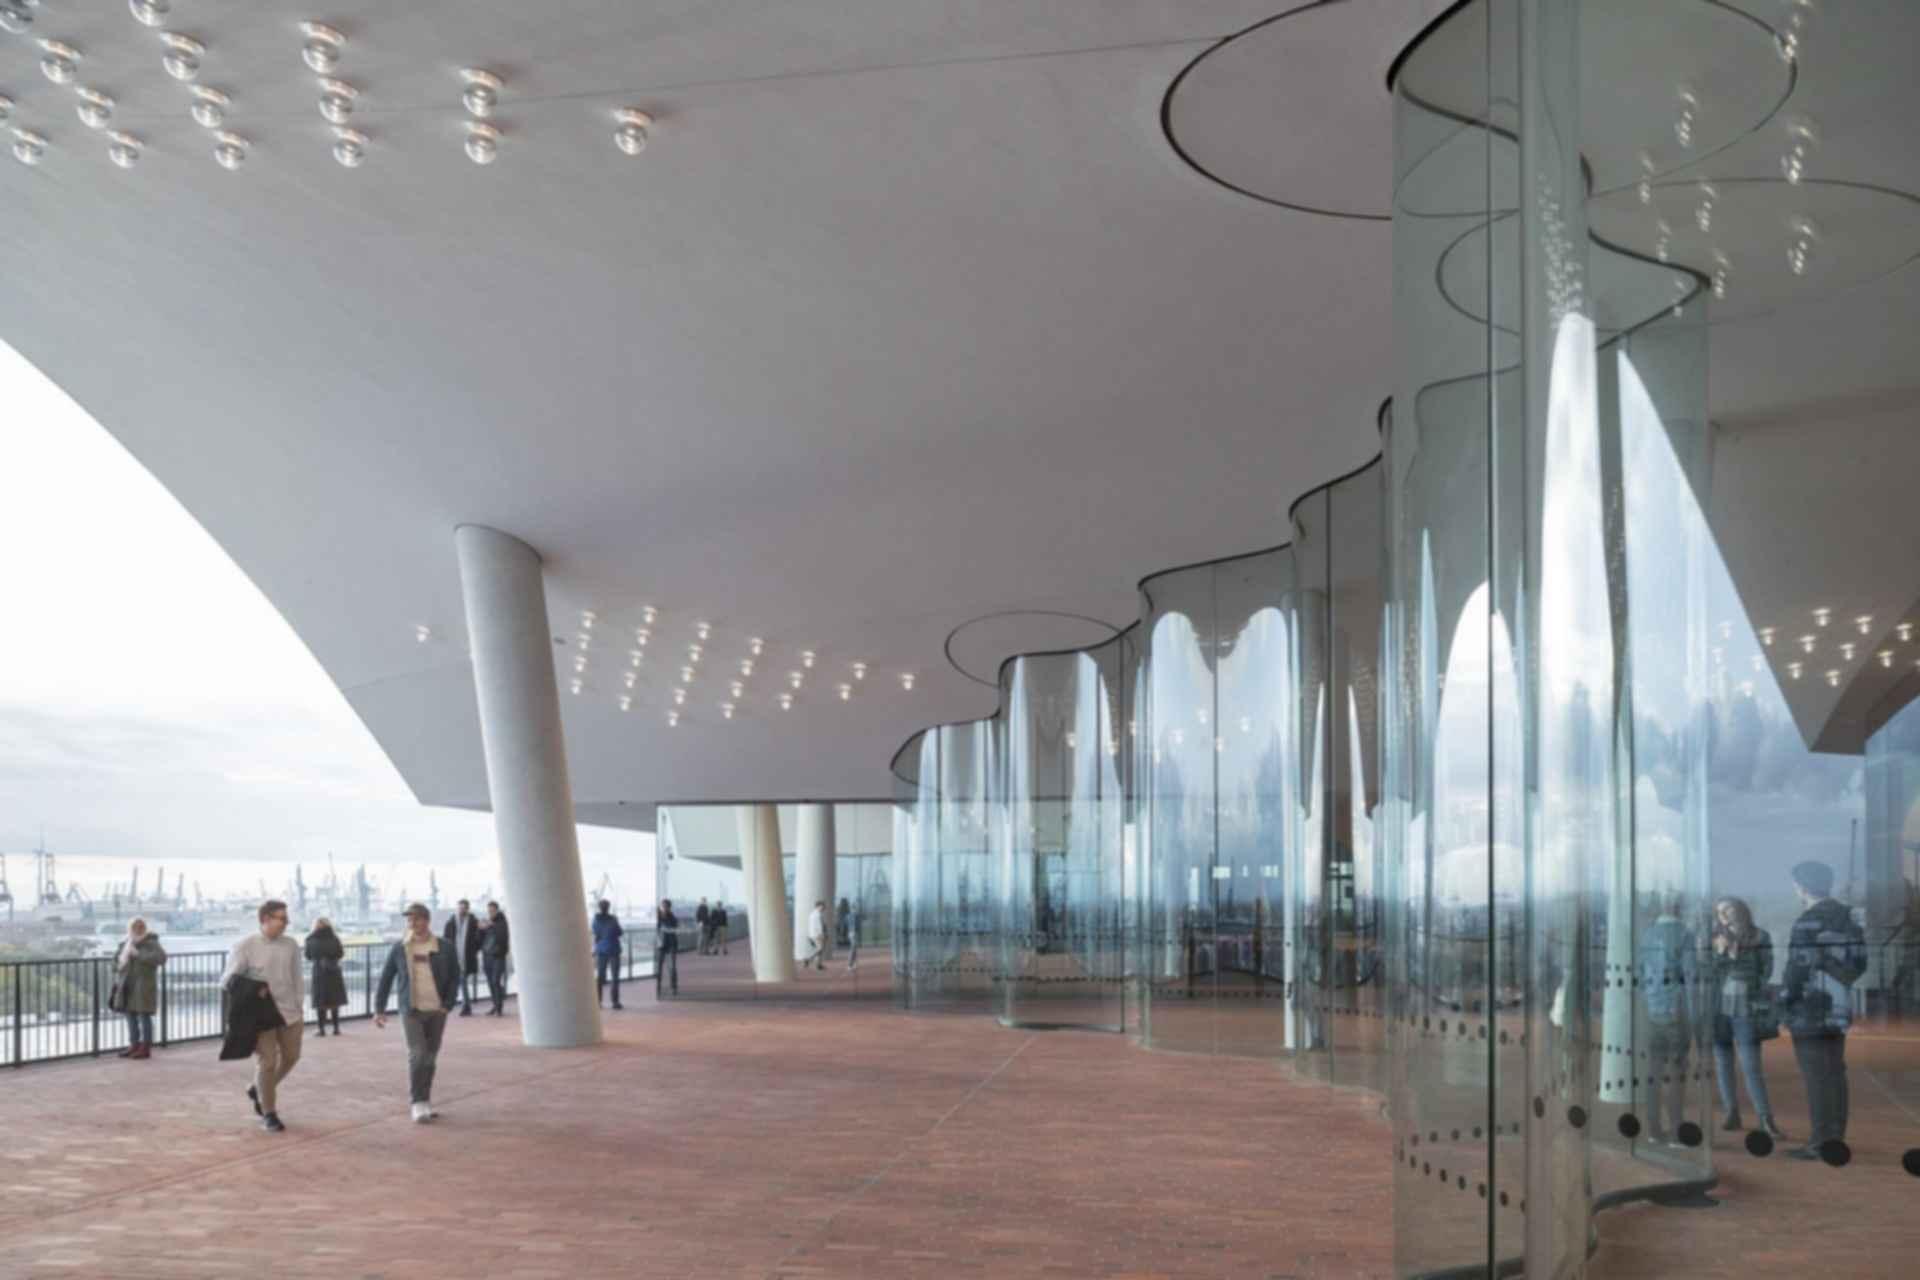 Elbphilharmonie - viewing deck